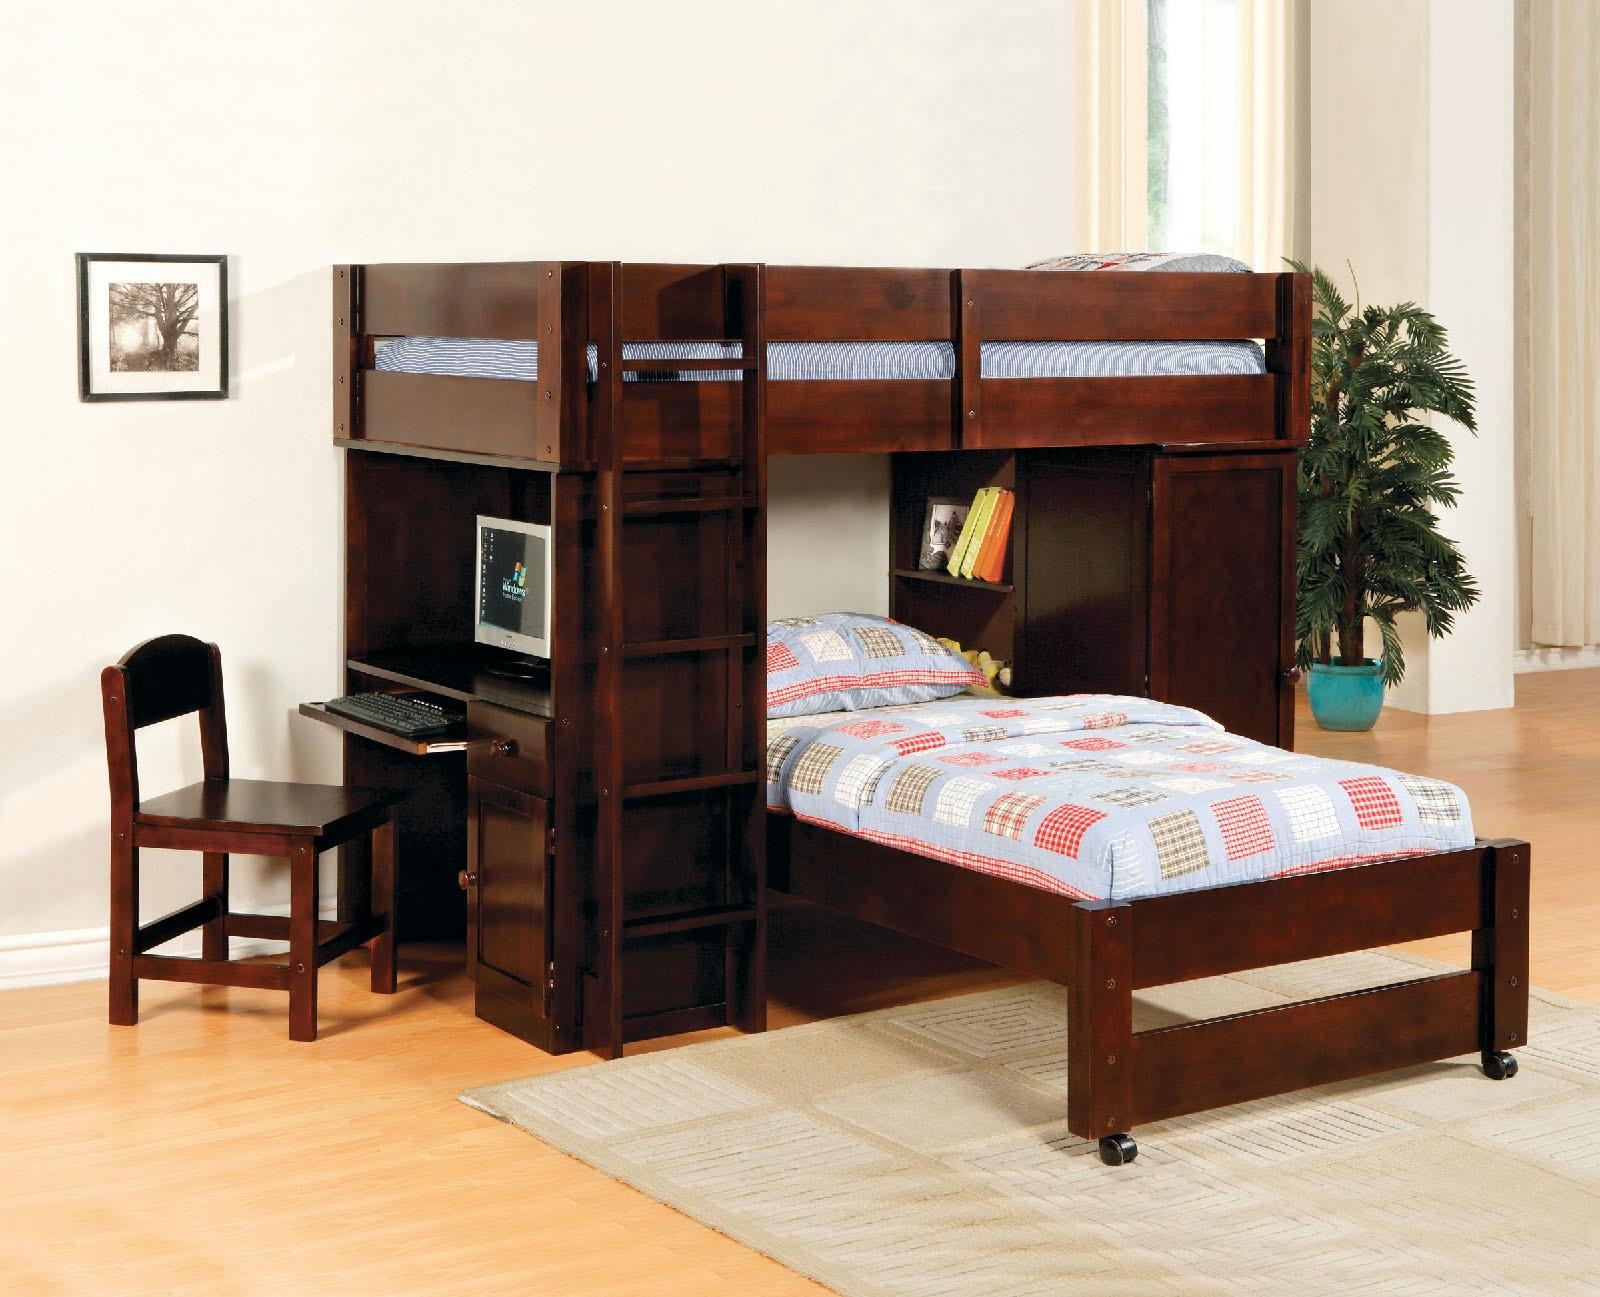 Furniture of America All-In-One Twin/Twin Loft Bed Dark Cherry & Furniture of America Bedroom All-In-One Twin/Twin Loft Bed Dark ...